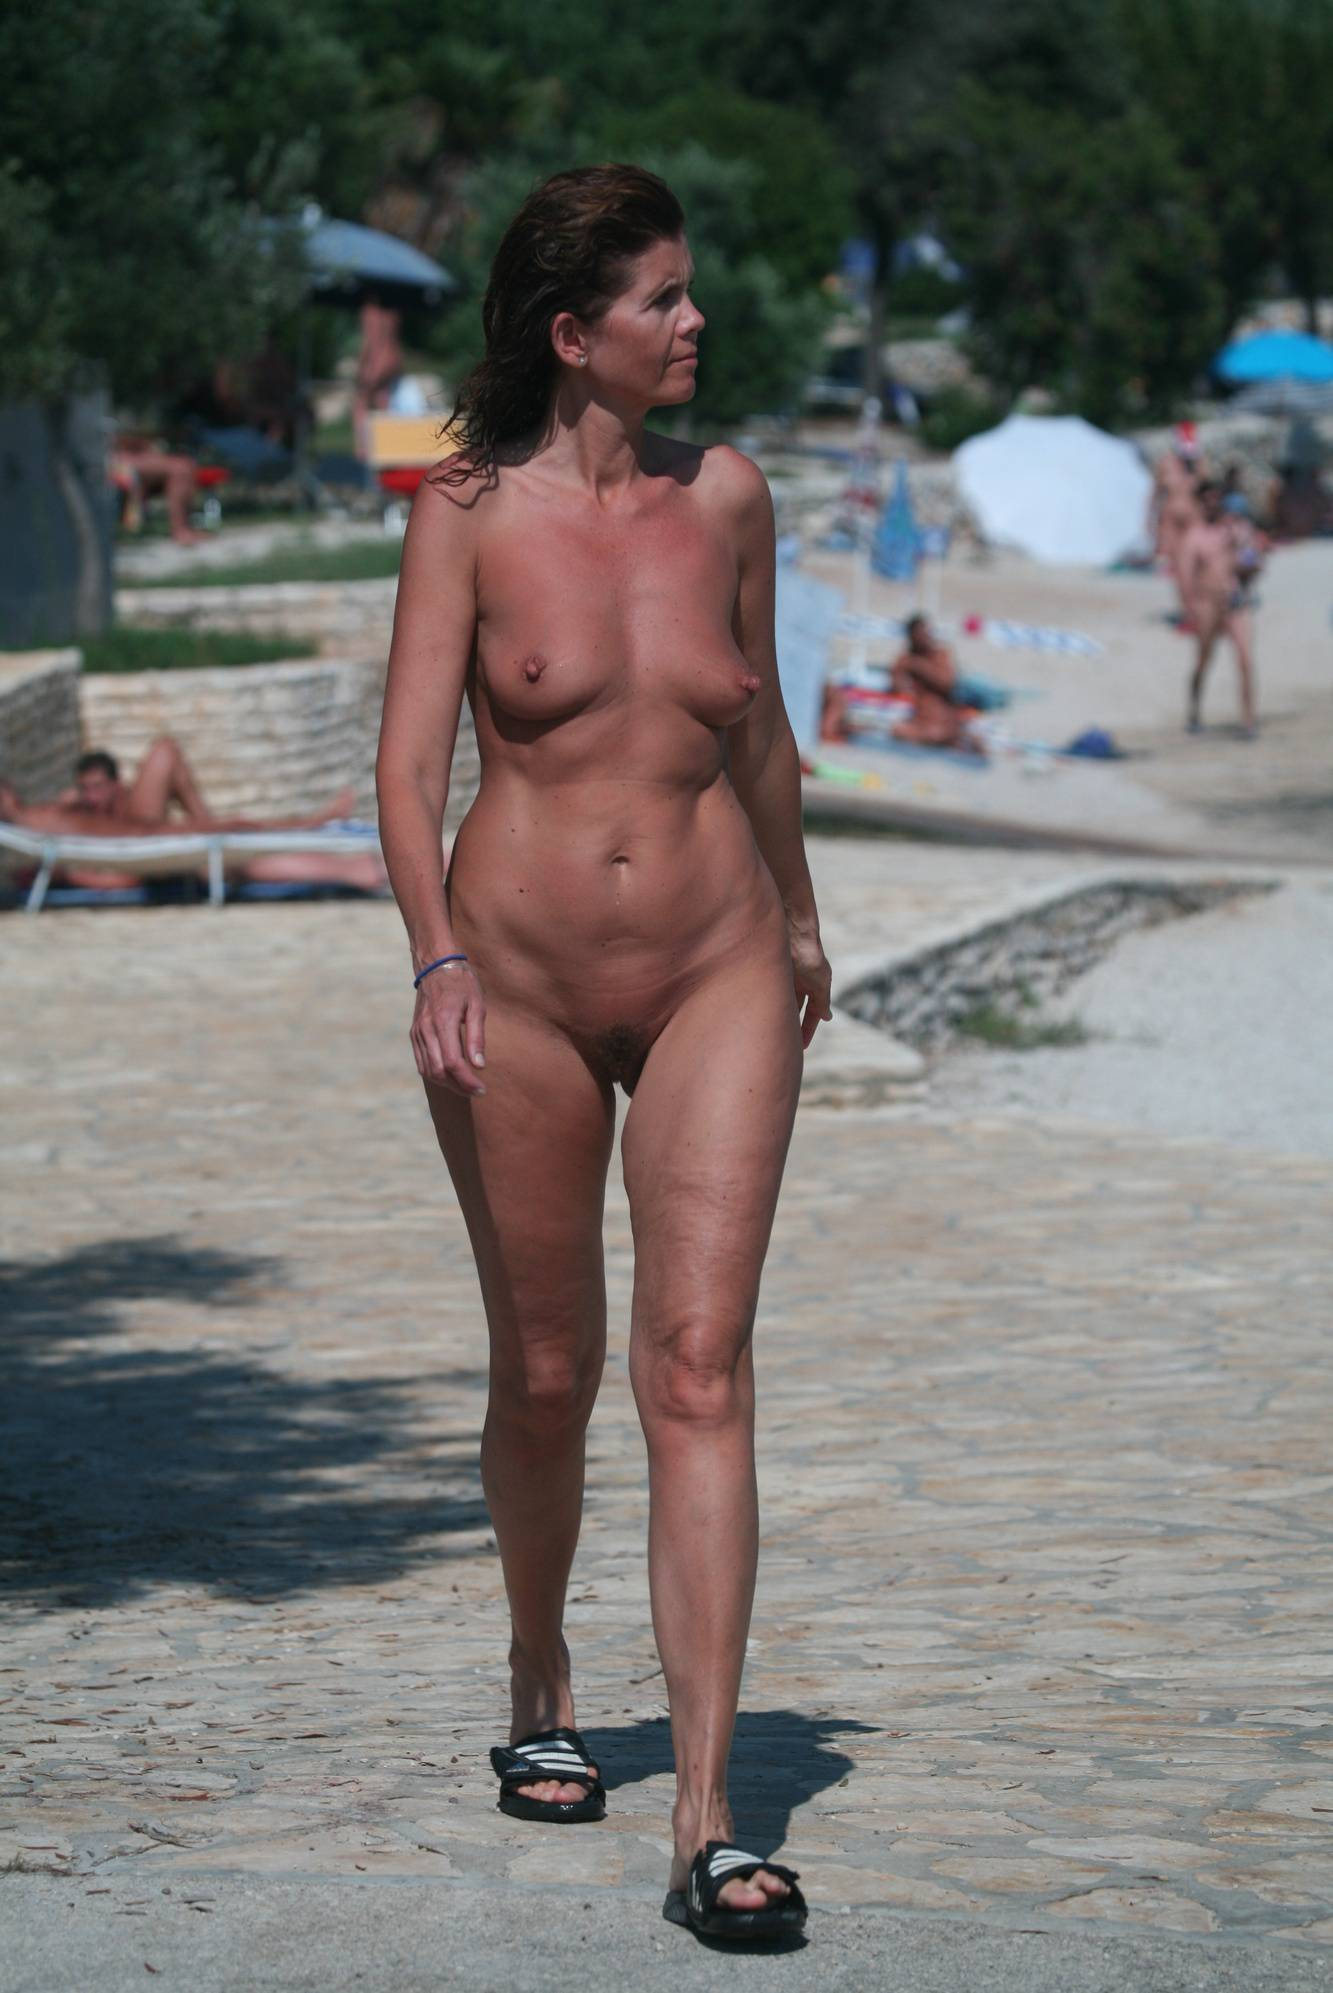 Nudist Pics Nudist Beach Pedestrians - 1